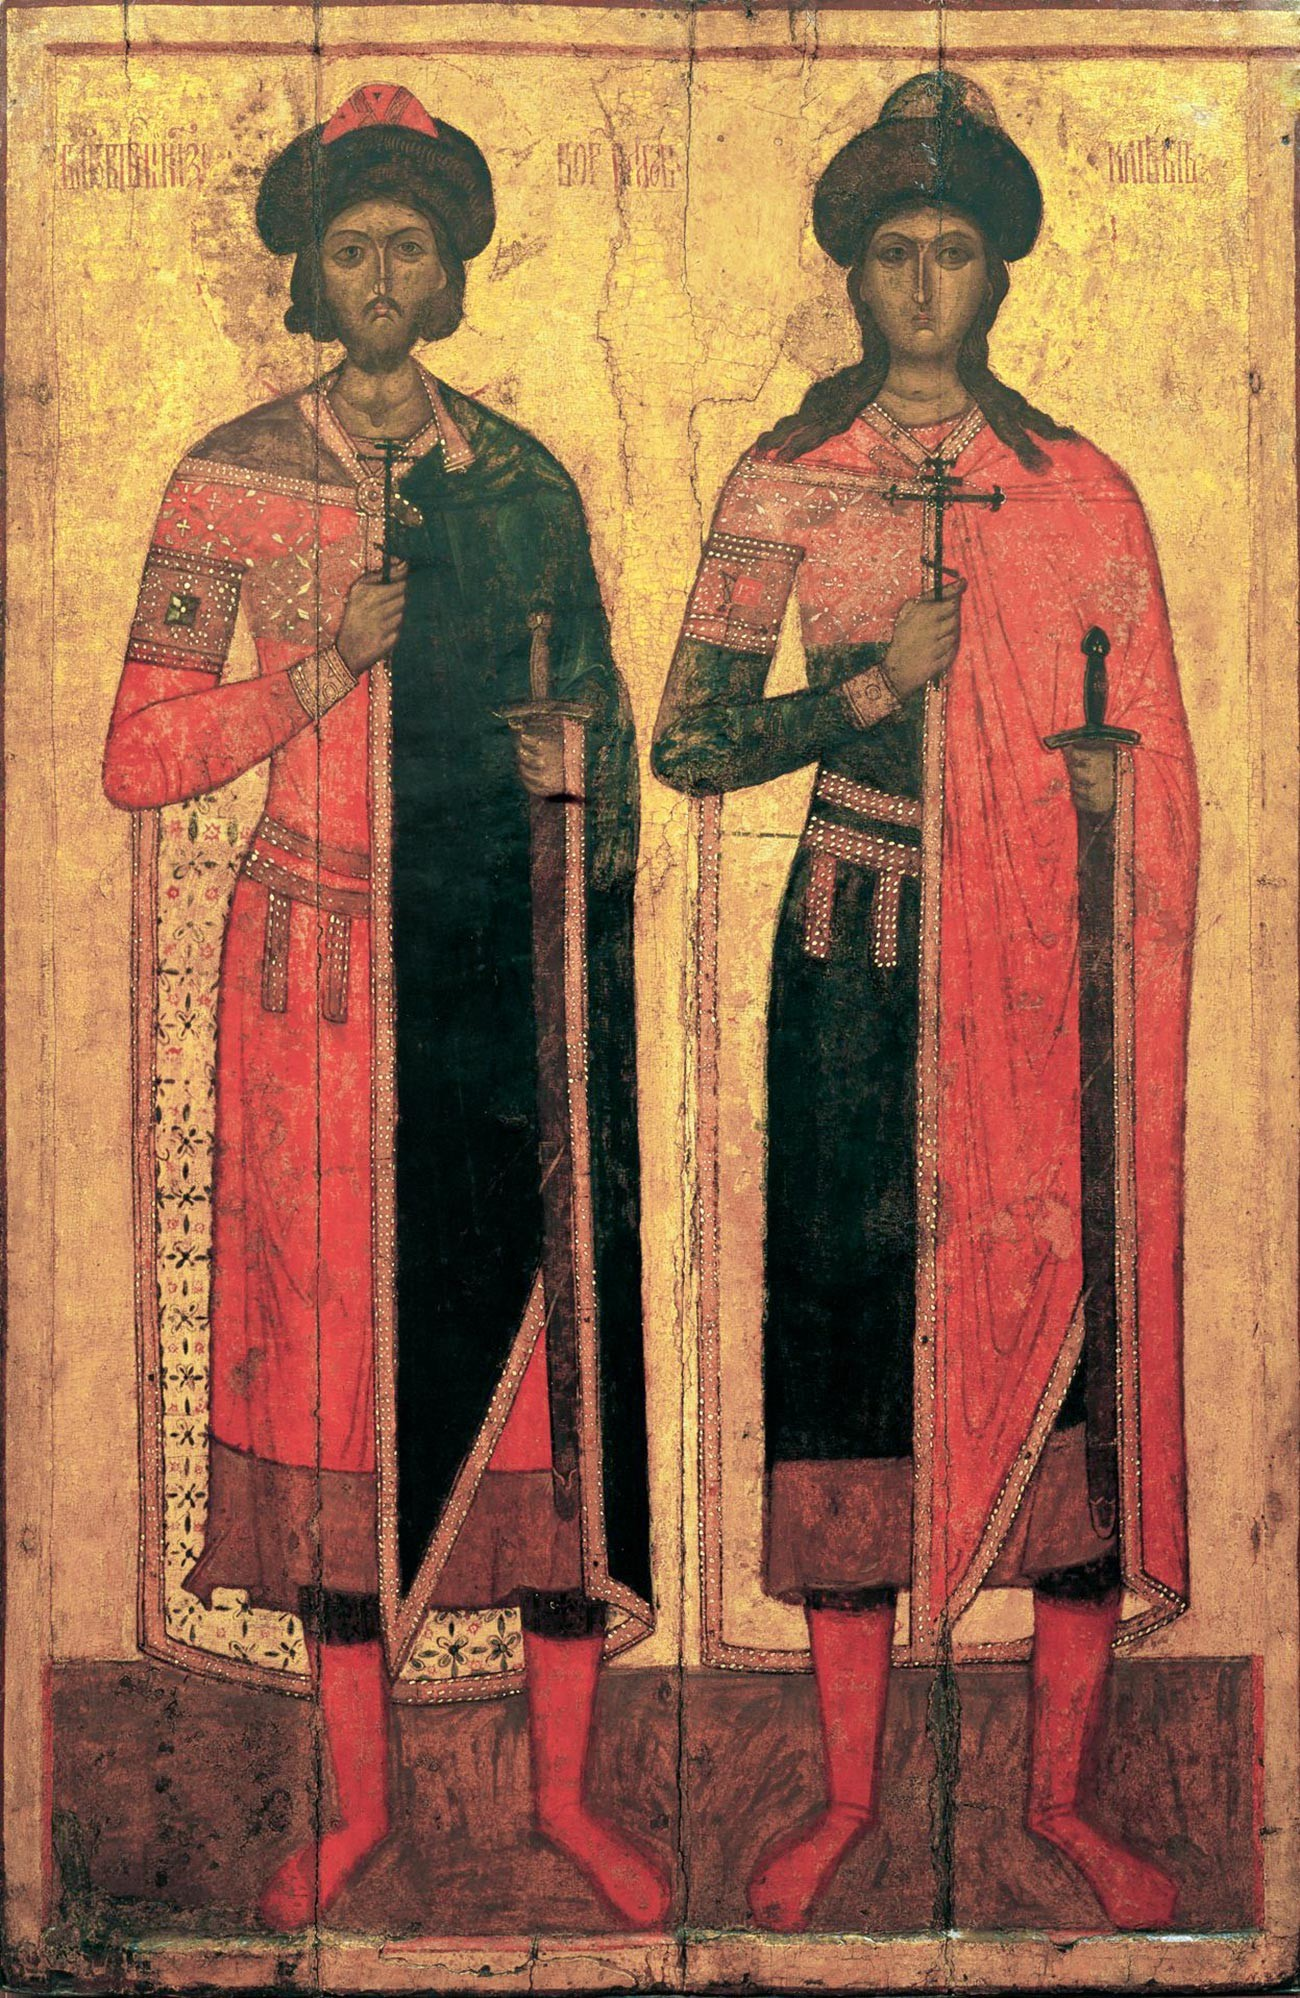 Príncipes Borís e Gleb, por volta de meados do século 14.